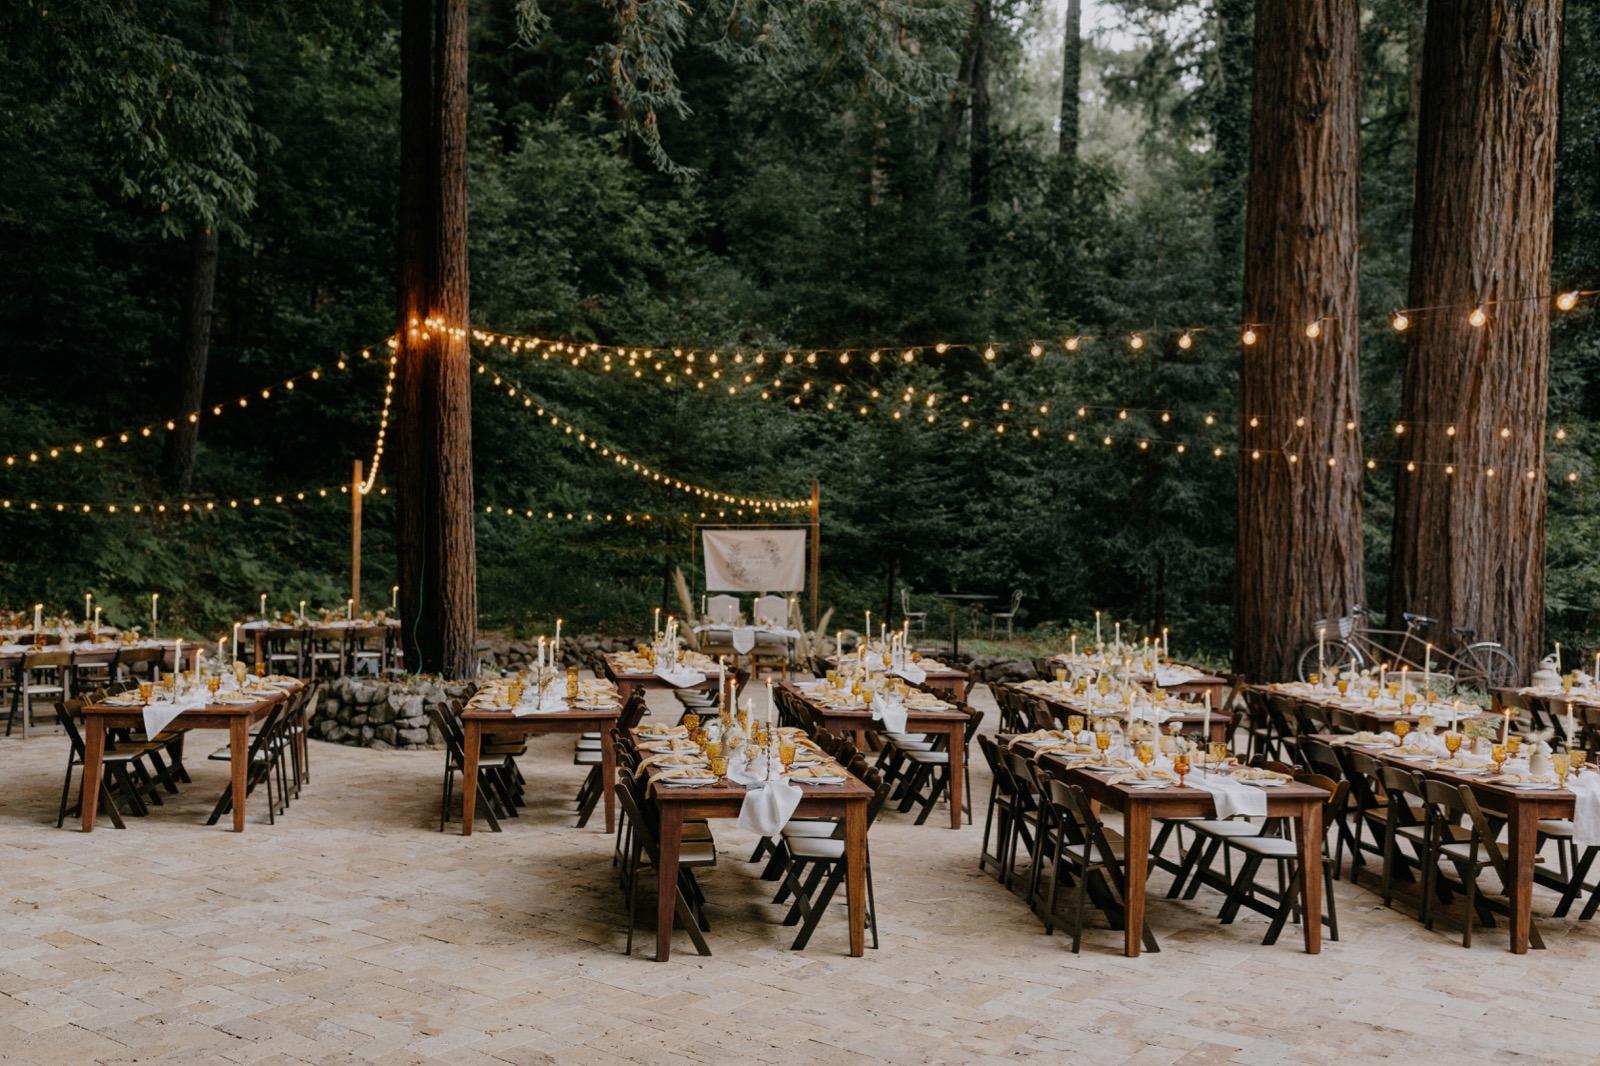 108_Emily & Jeff Wedding 0949_the-waterfall-lodge_forest_wedding_ben-lomond_intimate